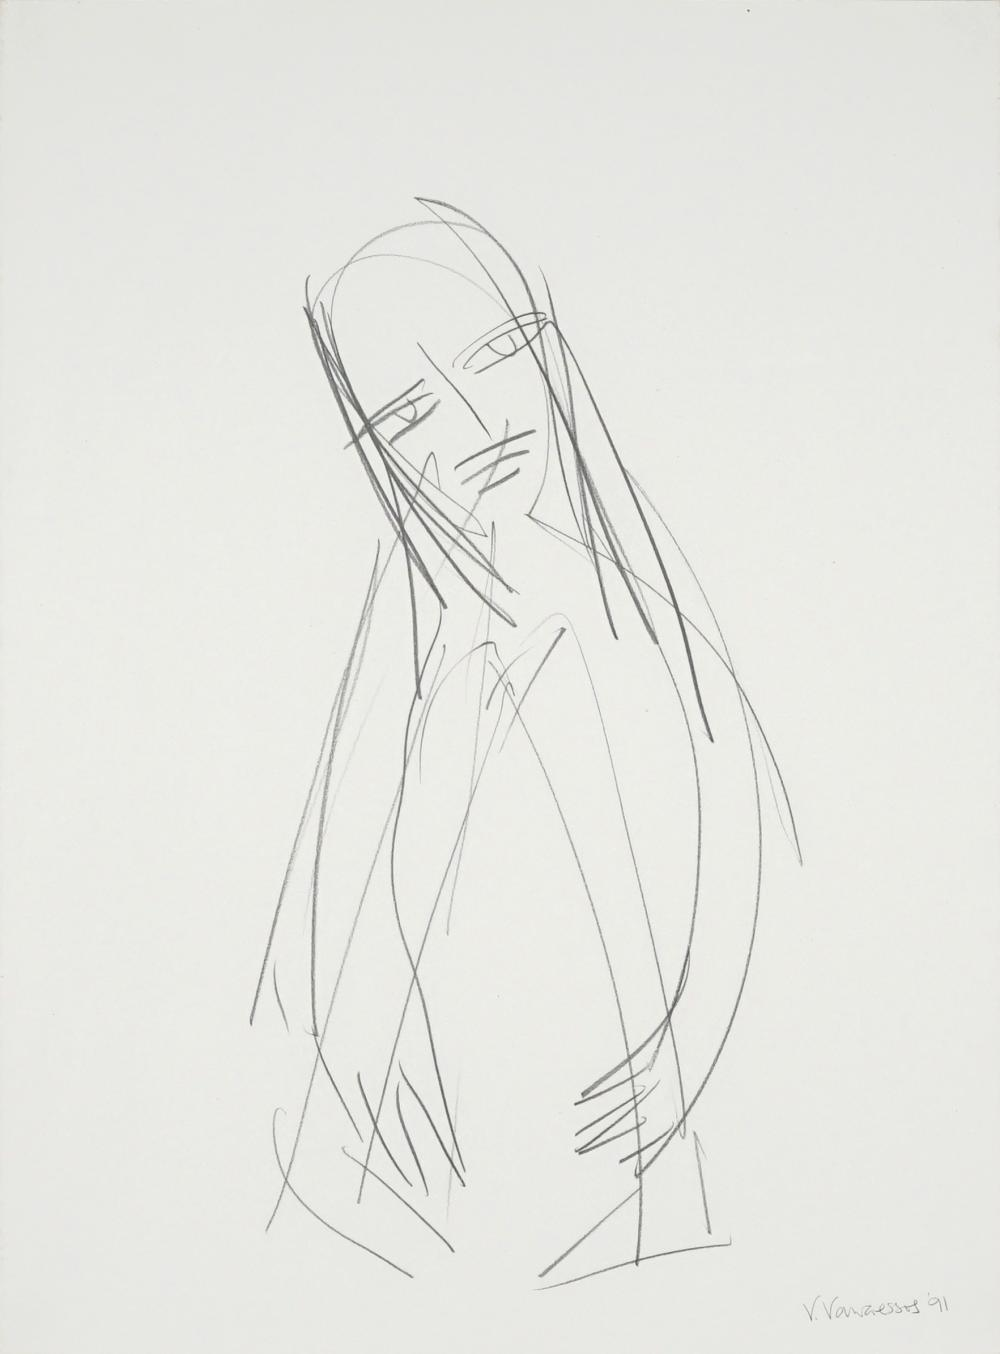 Vicki Varvaressos (1949 - ) - Crouching Woman, 1991 76 x 56cm